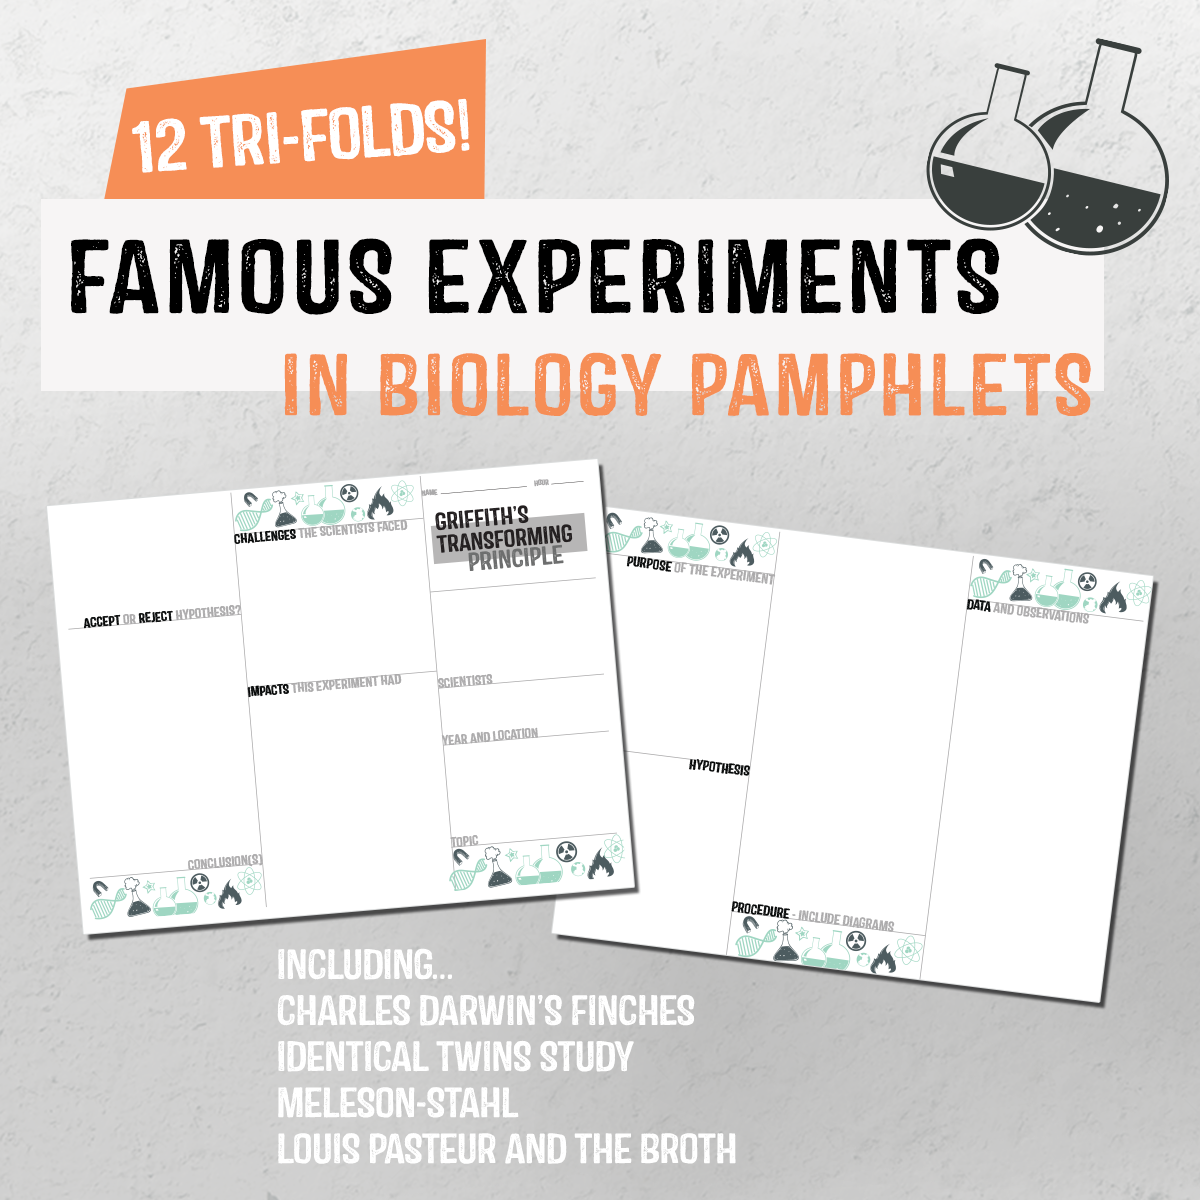 Famous Biology Experiments Pamphlets